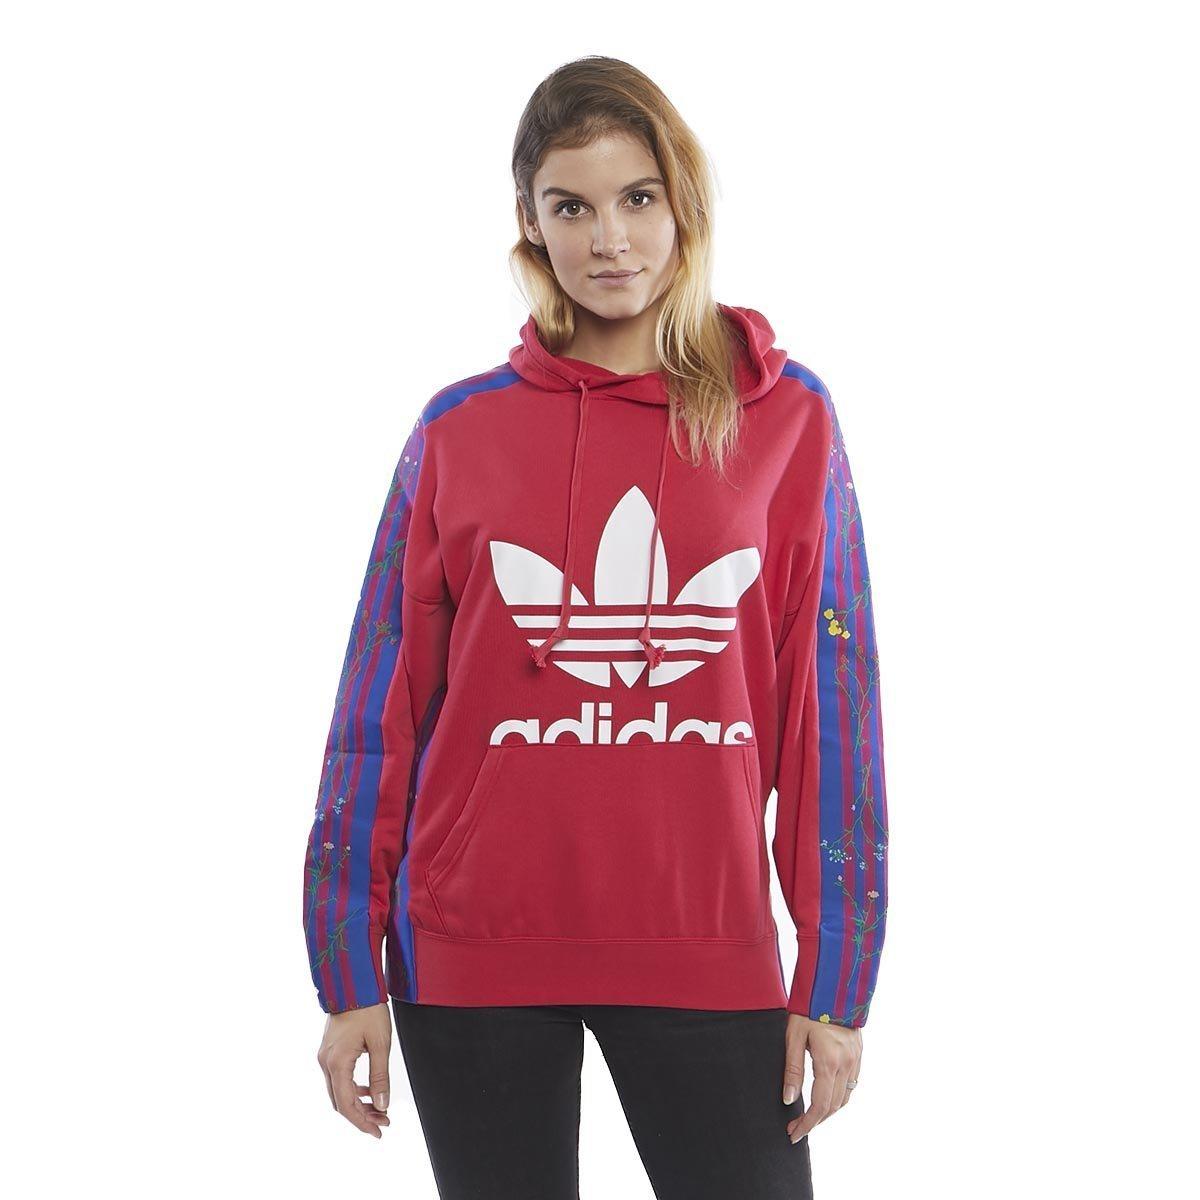 adidas originals wmns hoodie size chart